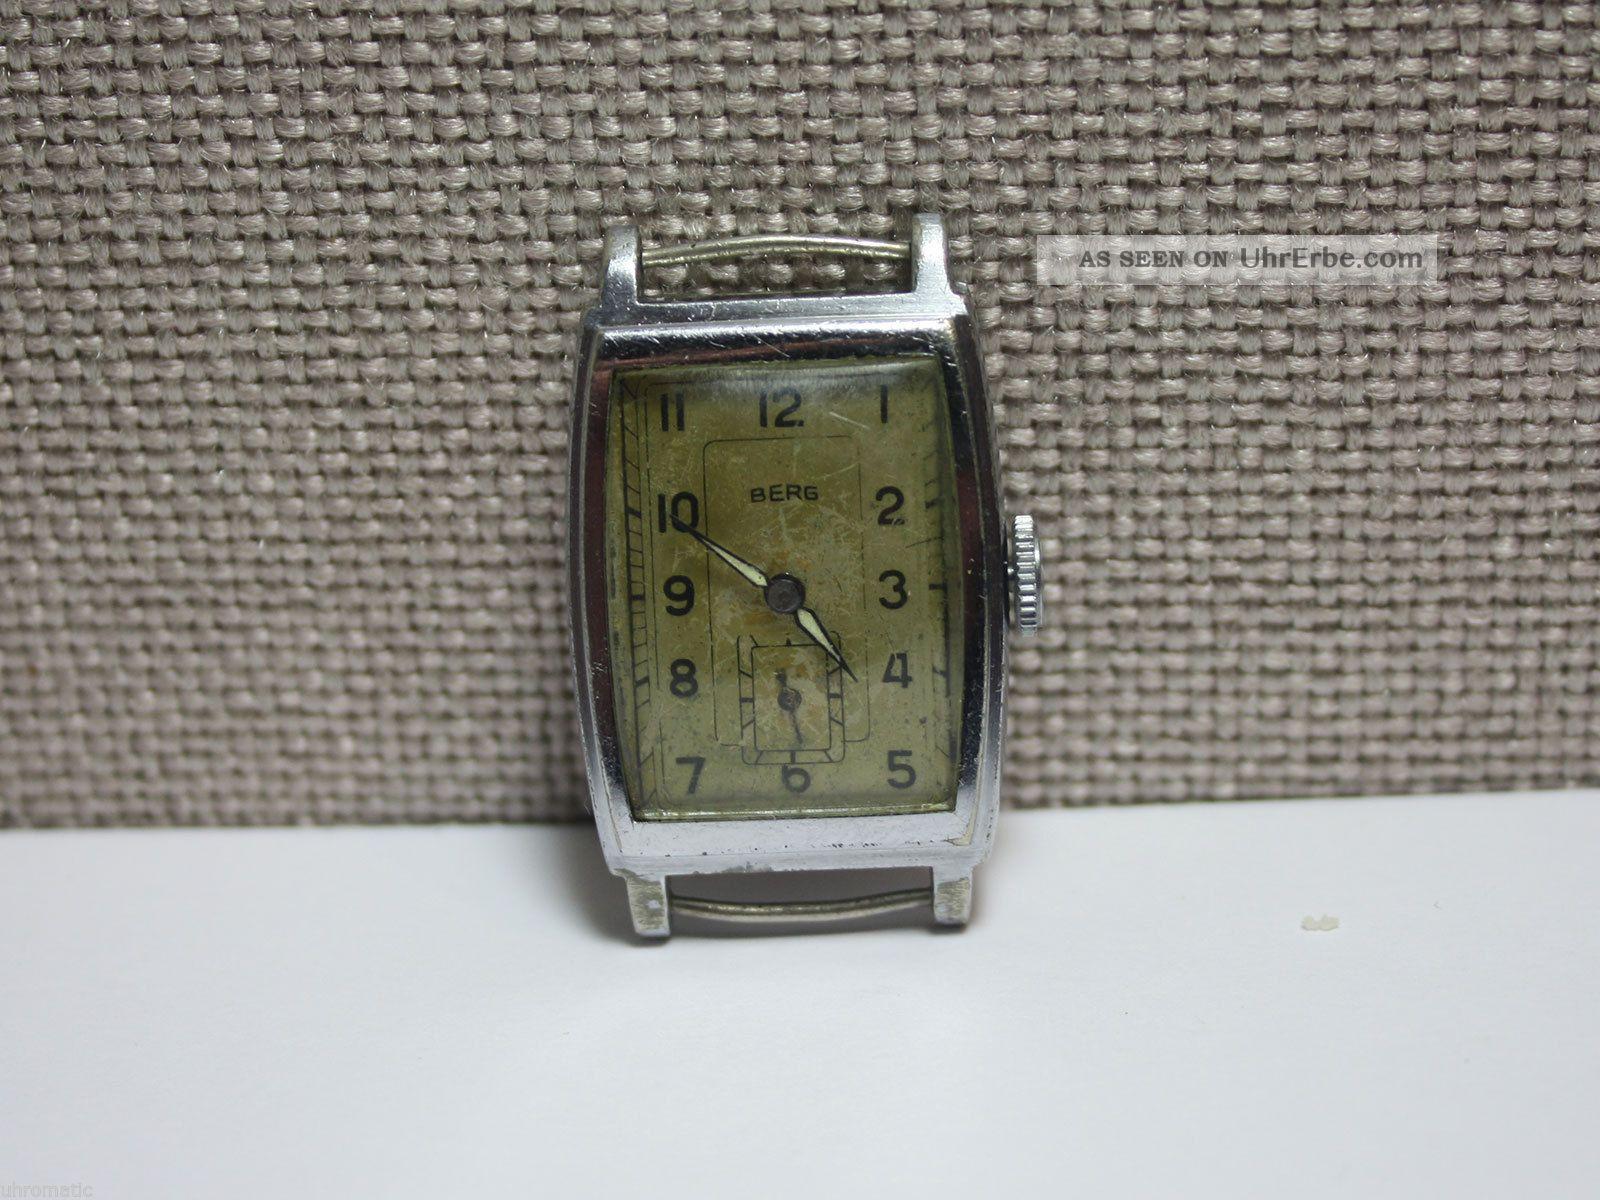 Berg - Rechteckige Armbanduhr Mit Urofa 58 Uhrwerk.  Men ' S Wrist Watch Armbanduhren Bild